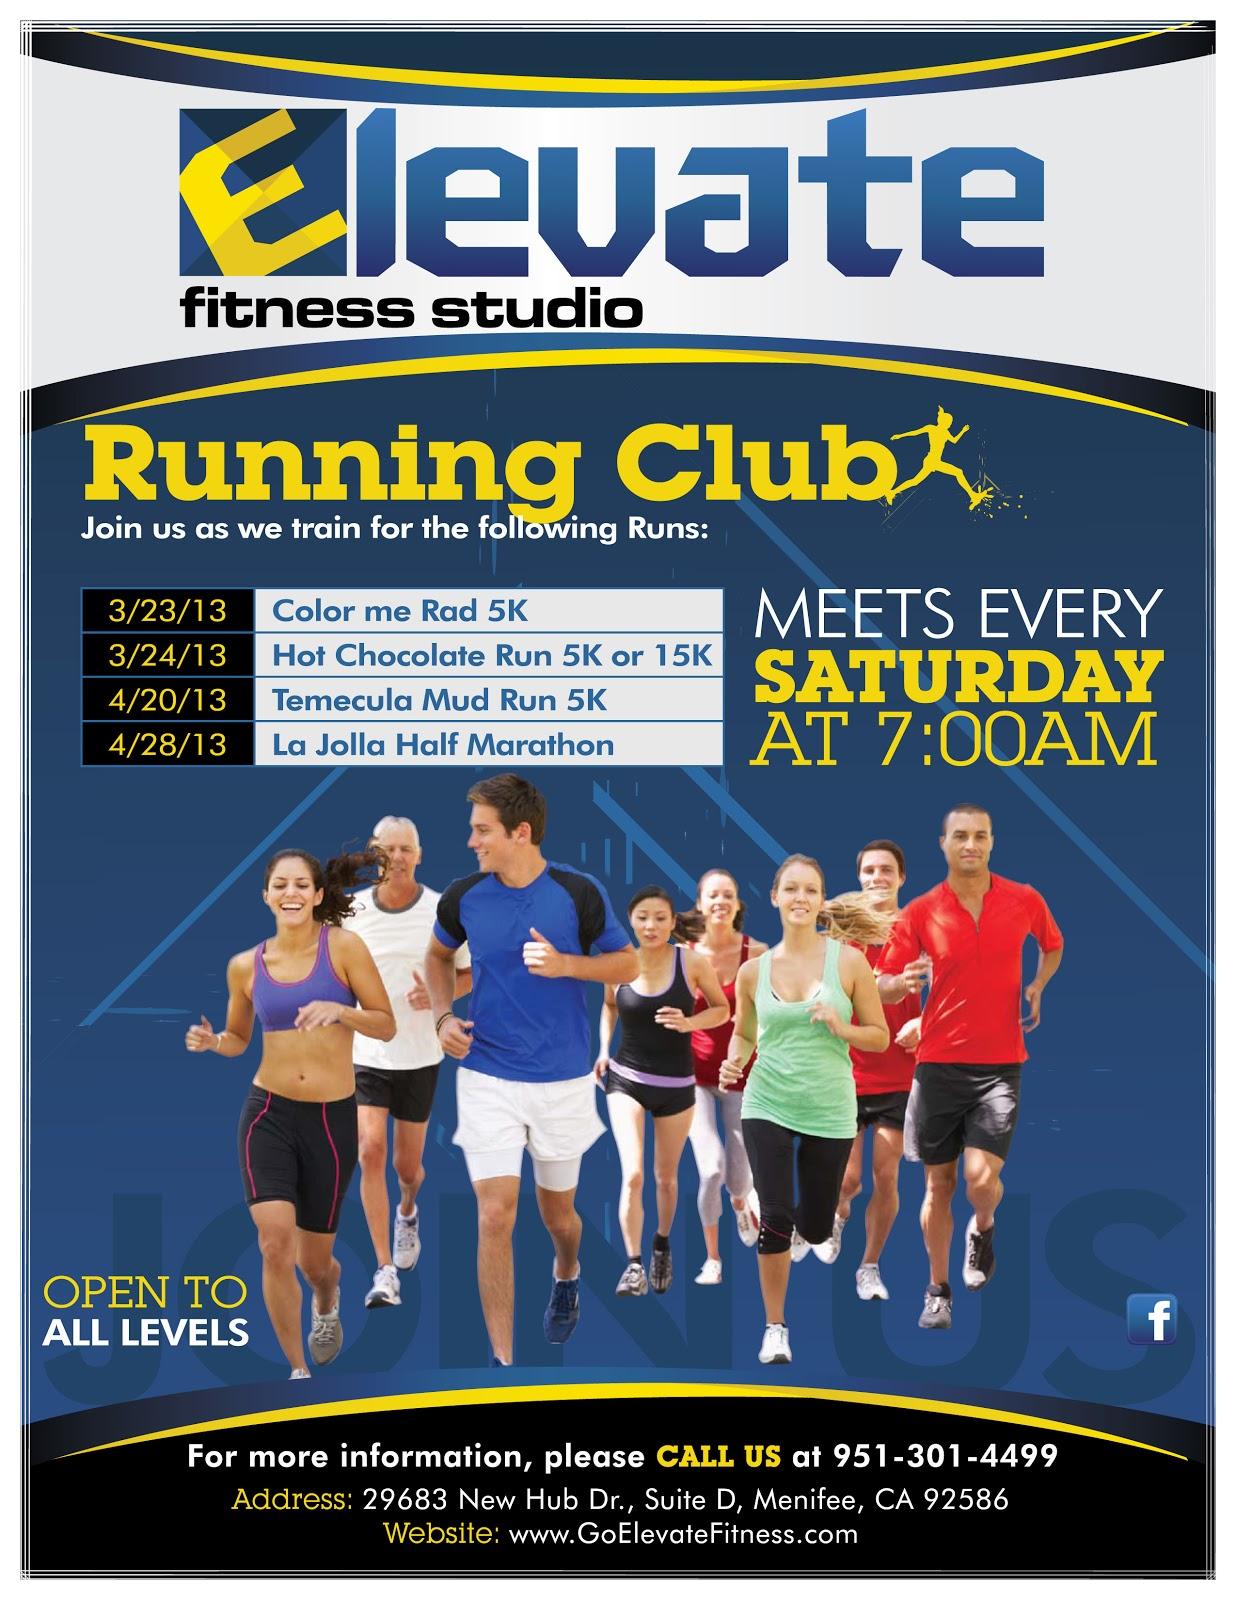 Run Club Running Club Meets Weekly on